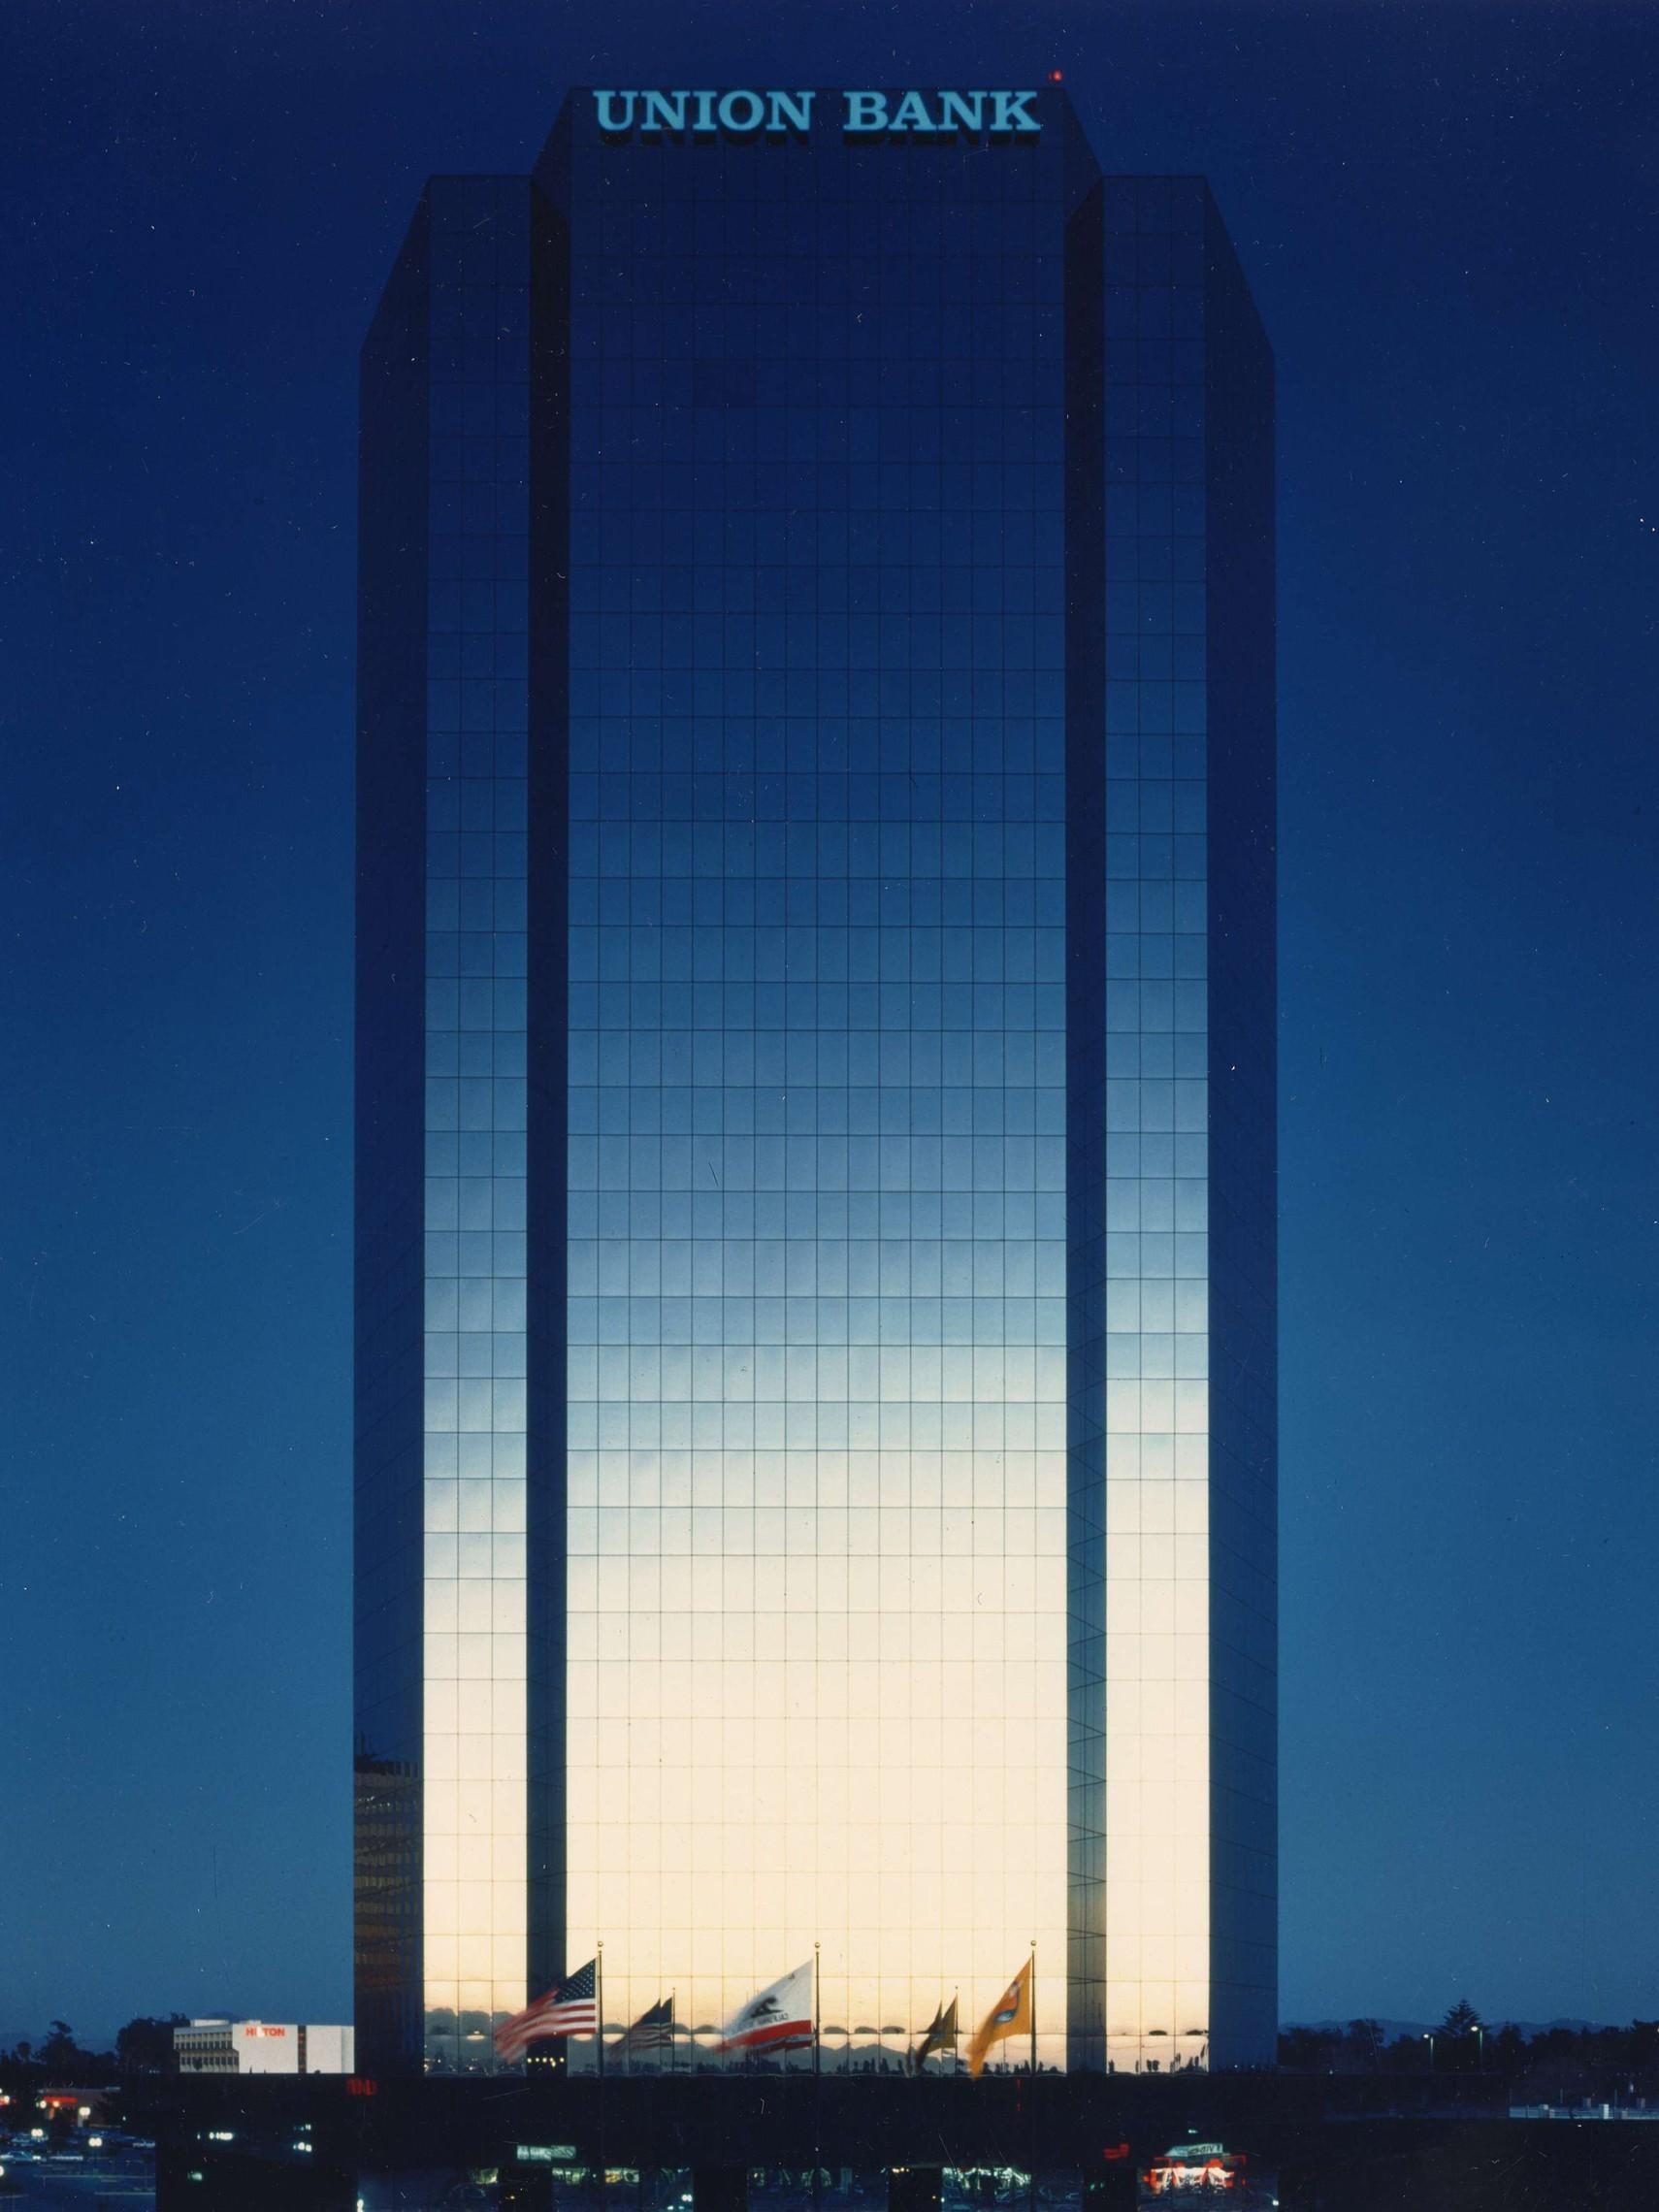 Oxnard Financial Plaza